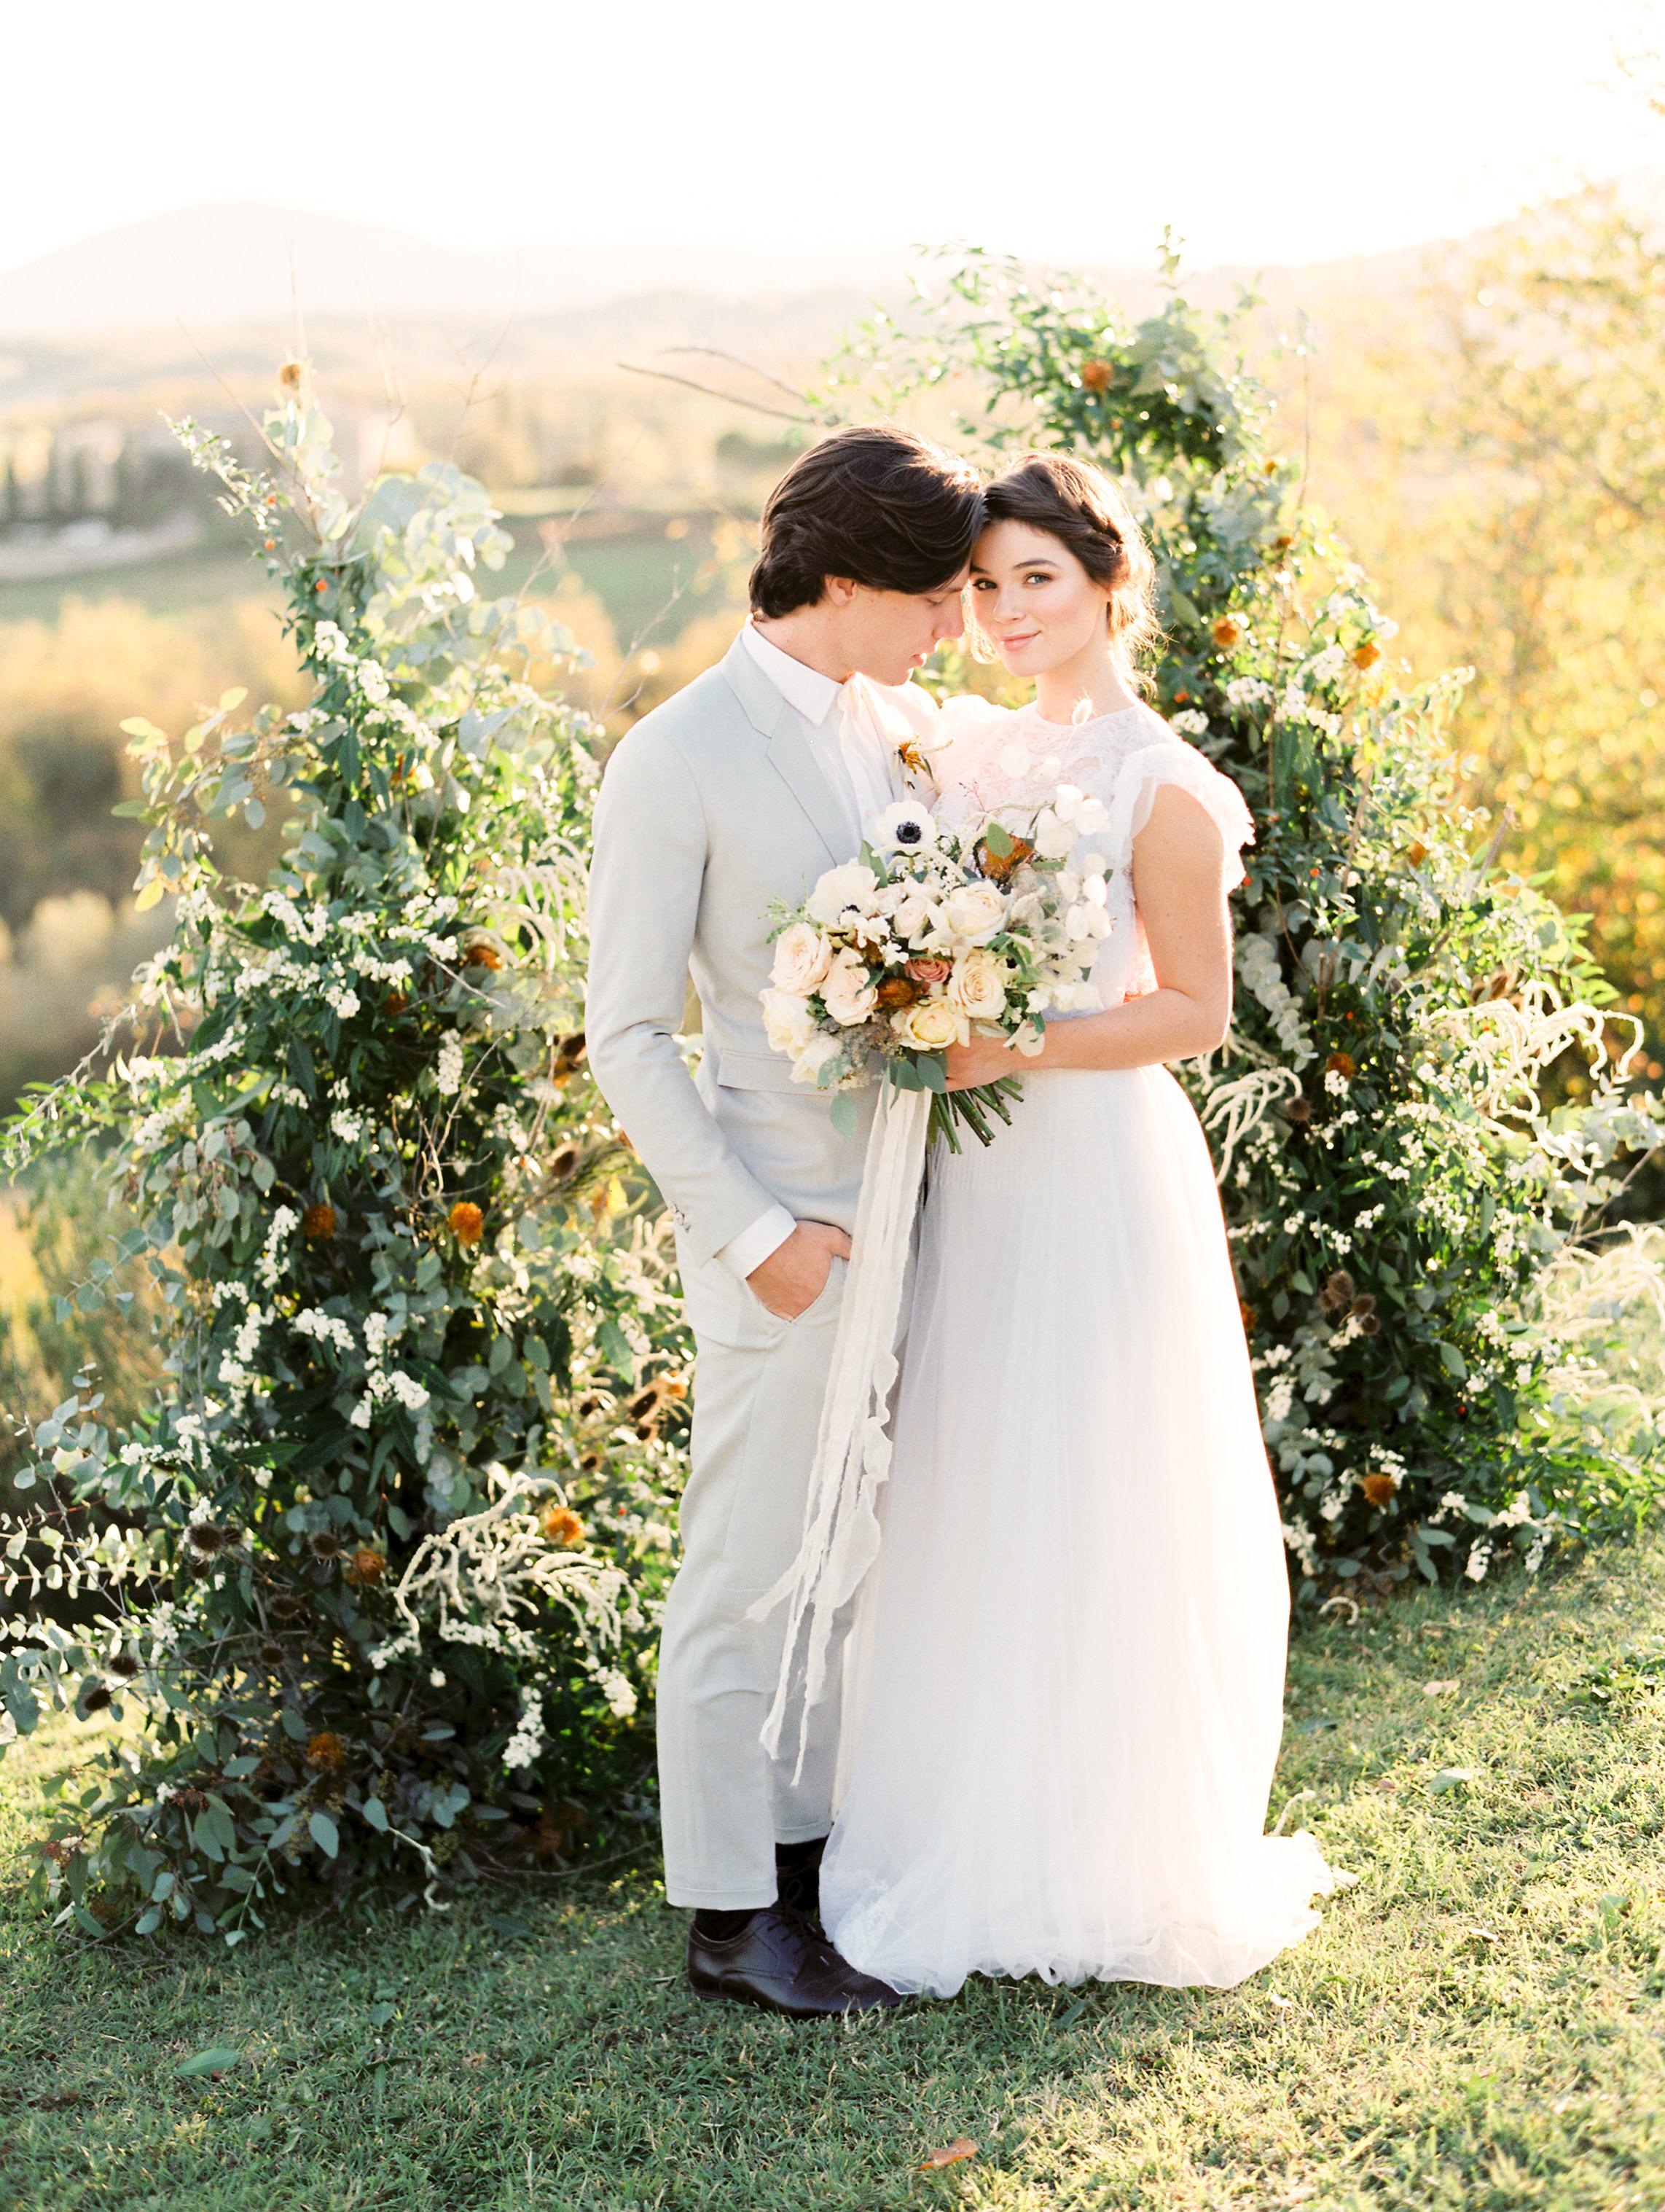 romantic-italy-wedding-in-tuscany-107.jpg